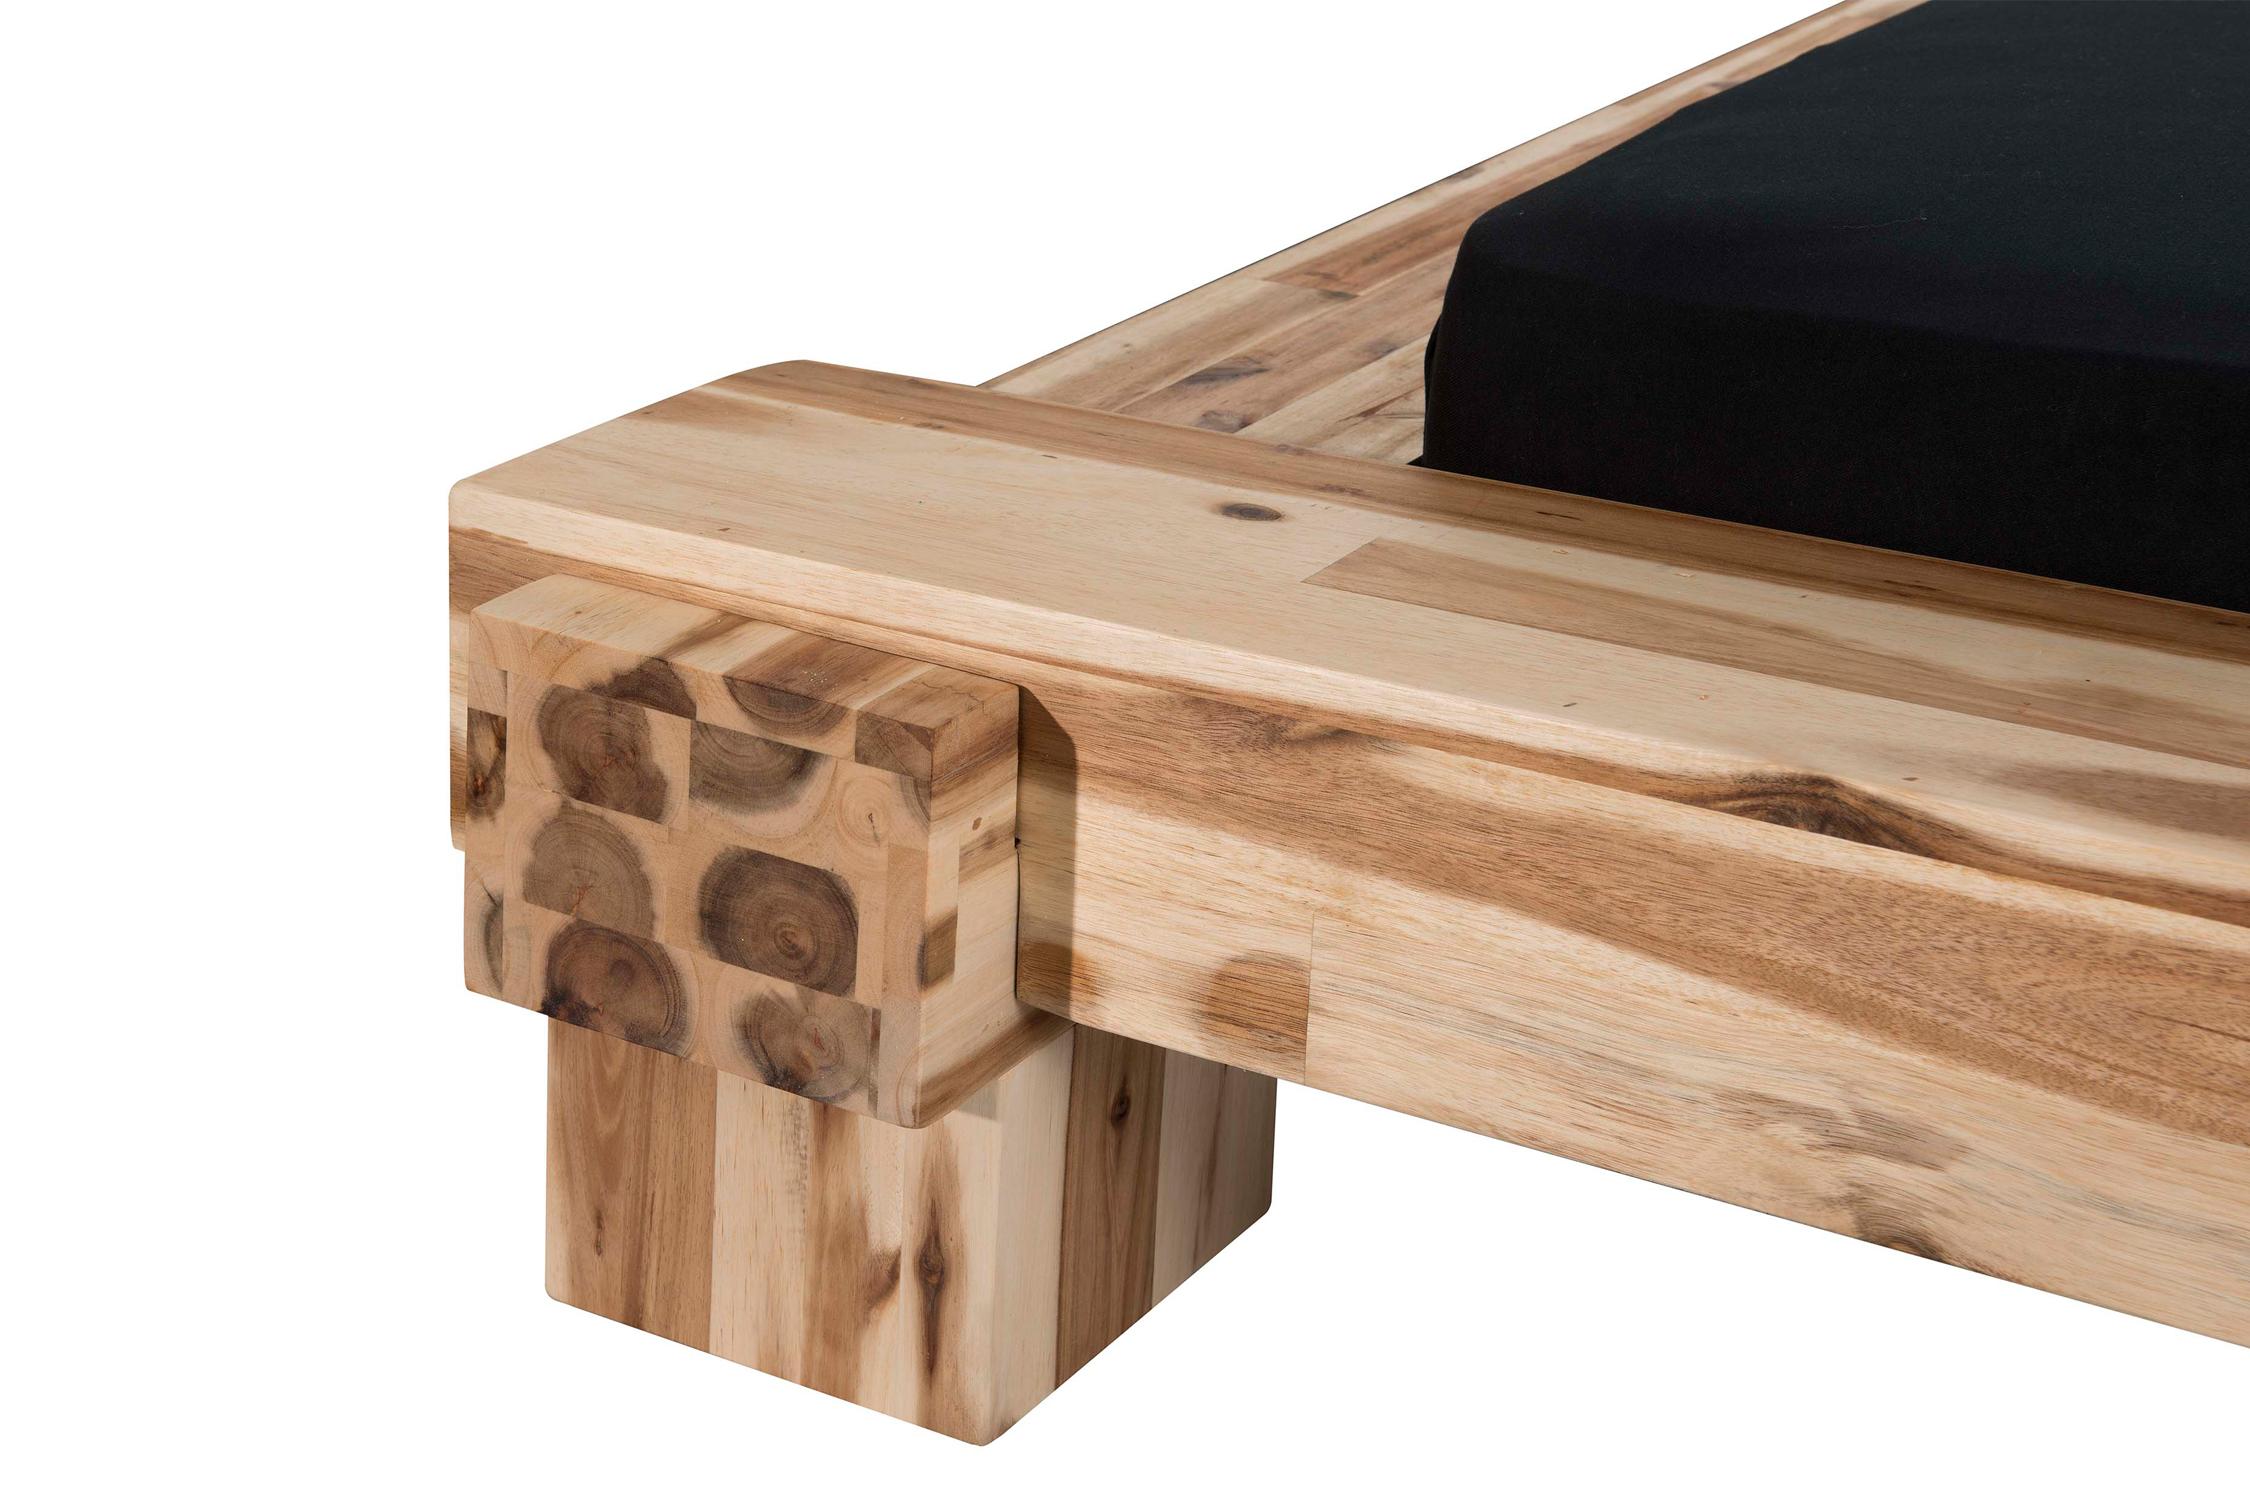 modular cali massivholzbett akazie m bel letz ihr online shop. Black Bedroom Furniture Sets. Home Design Ideas